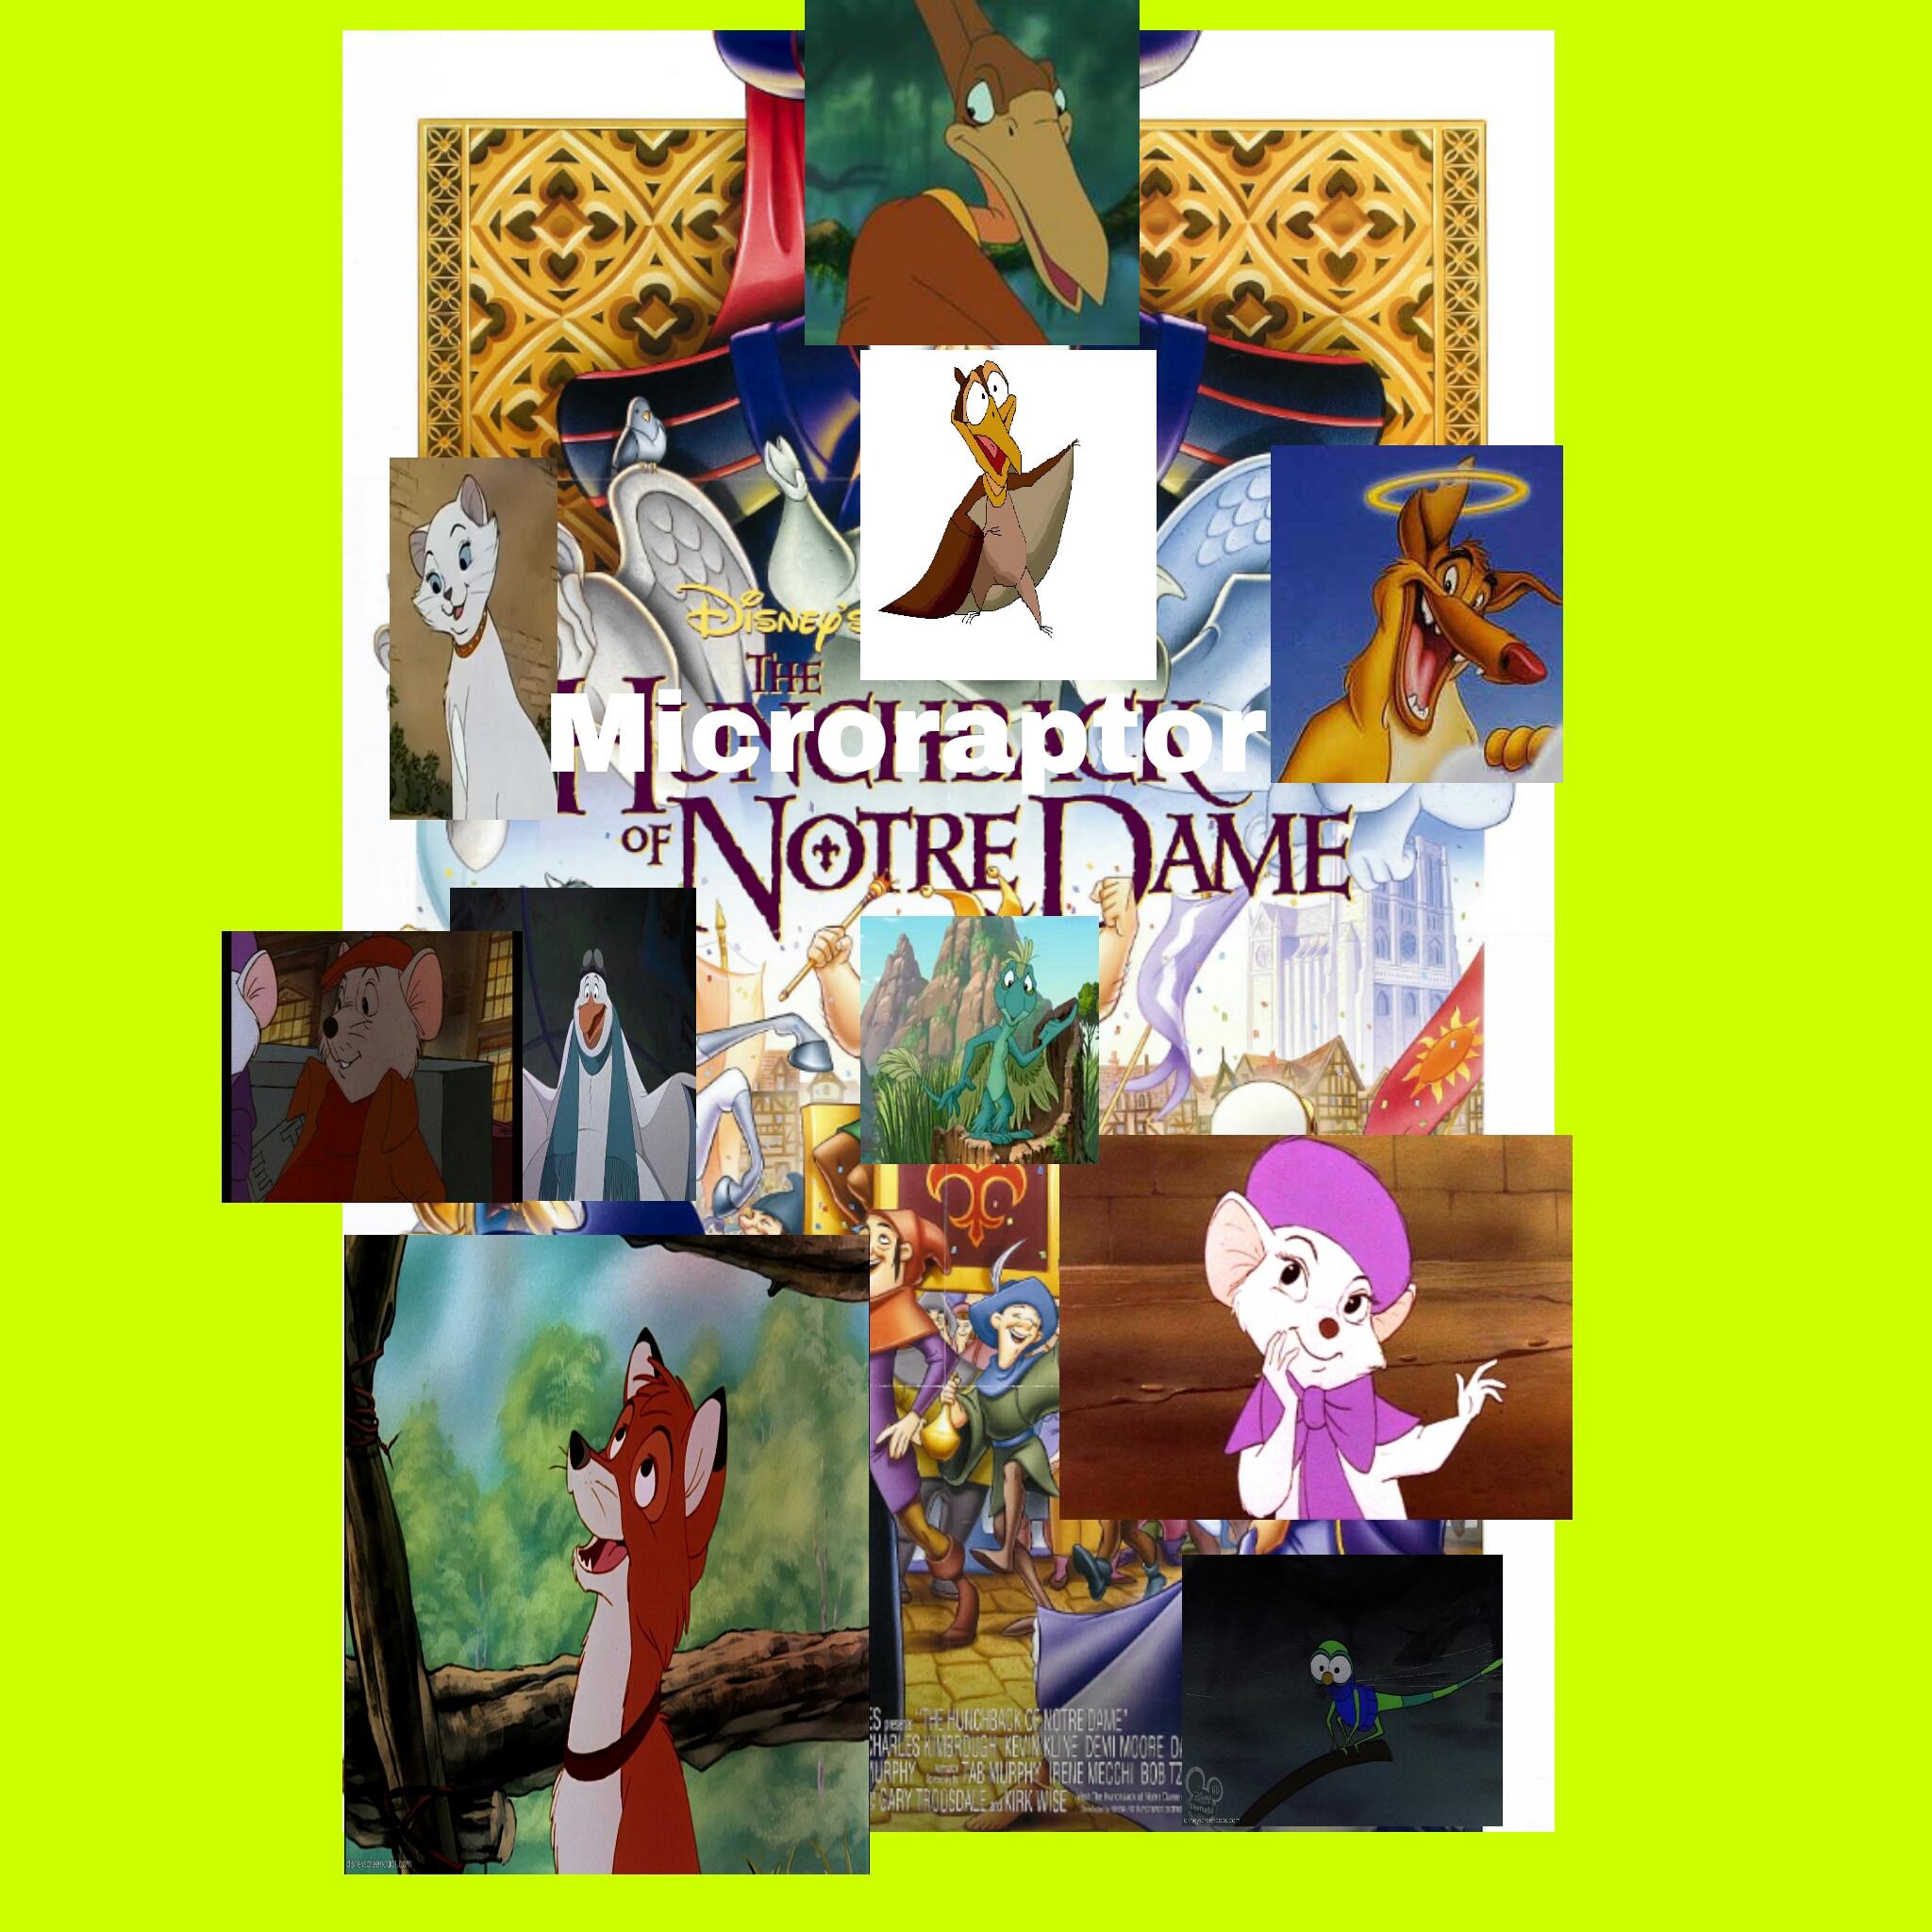 The Microraptor of Notre Dame